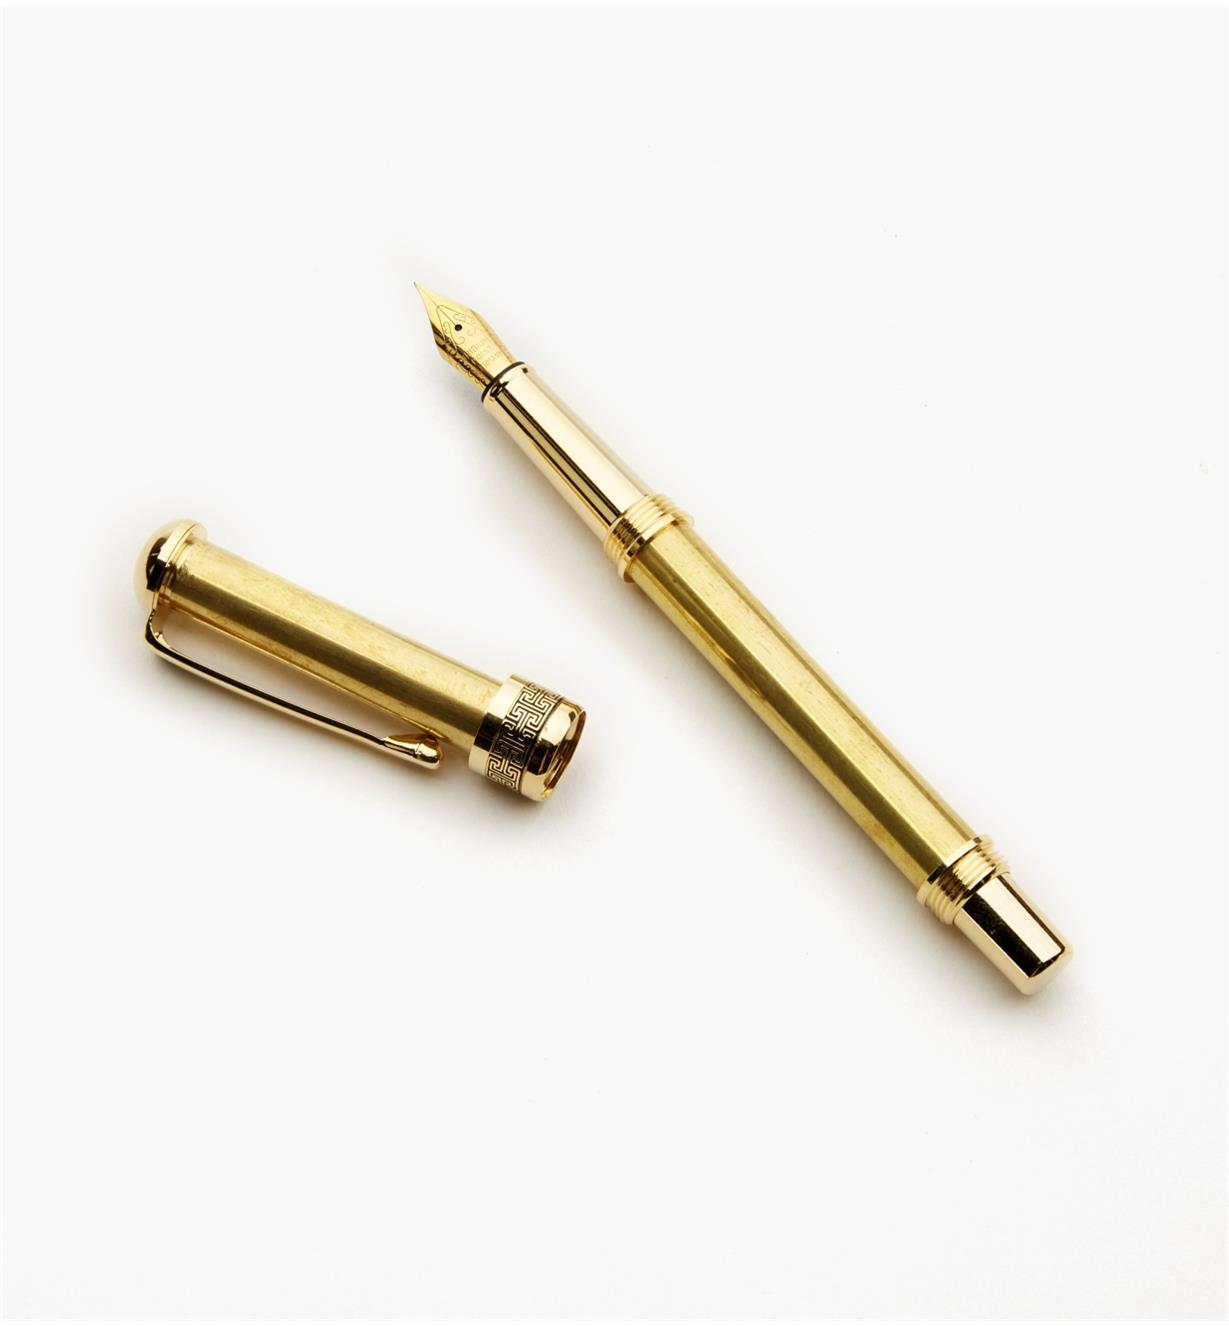 88K8250 - New Series Fountain Pen, Gold